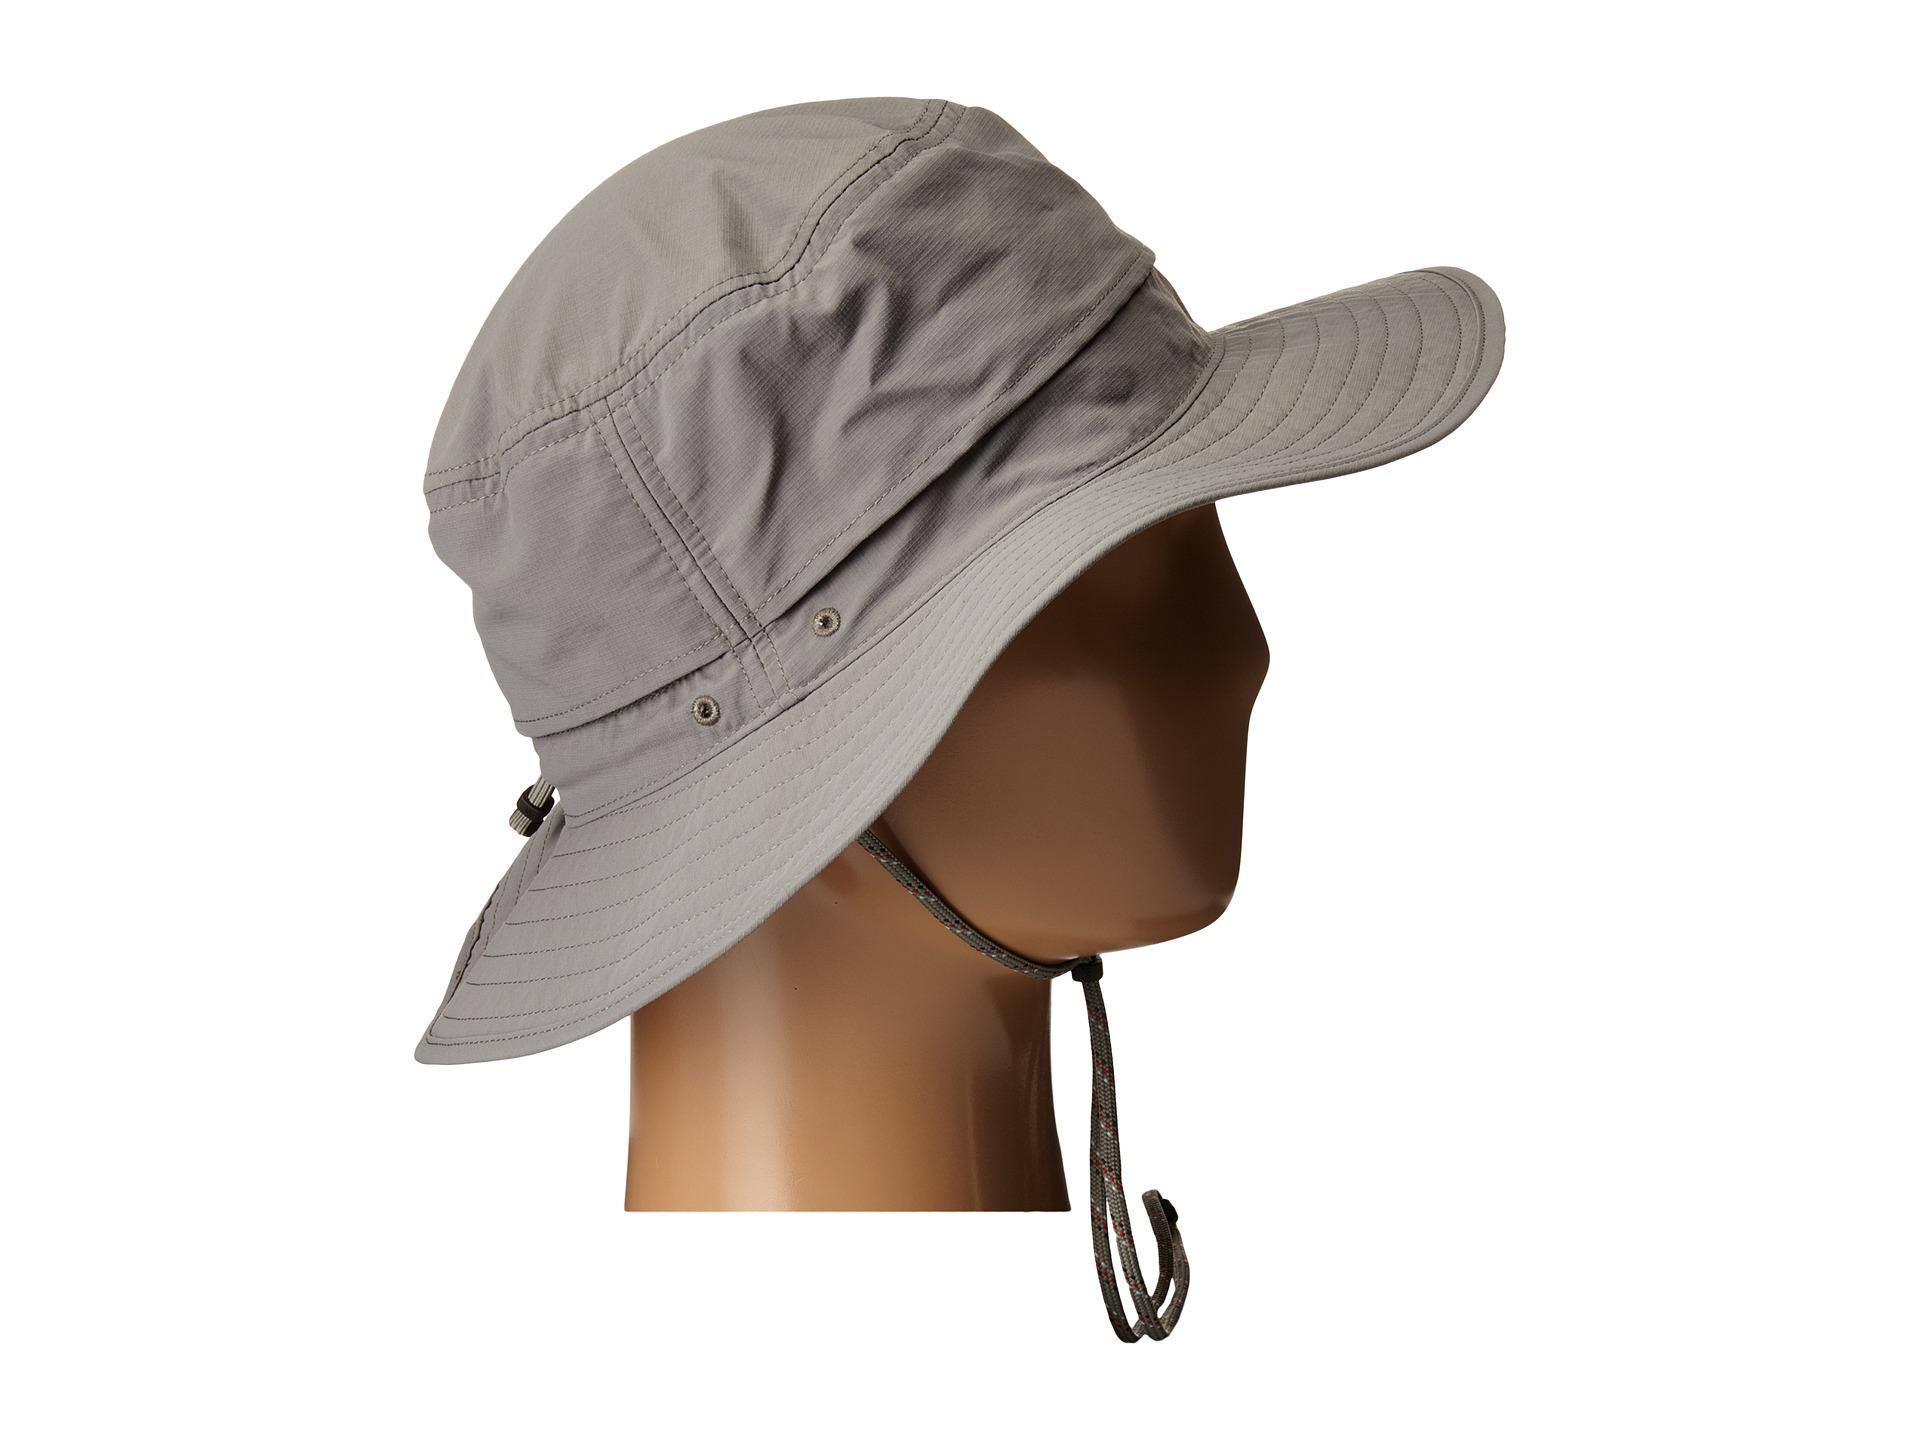 b9576d063 Men's Gray Horizon Breeze Brimmer Hat